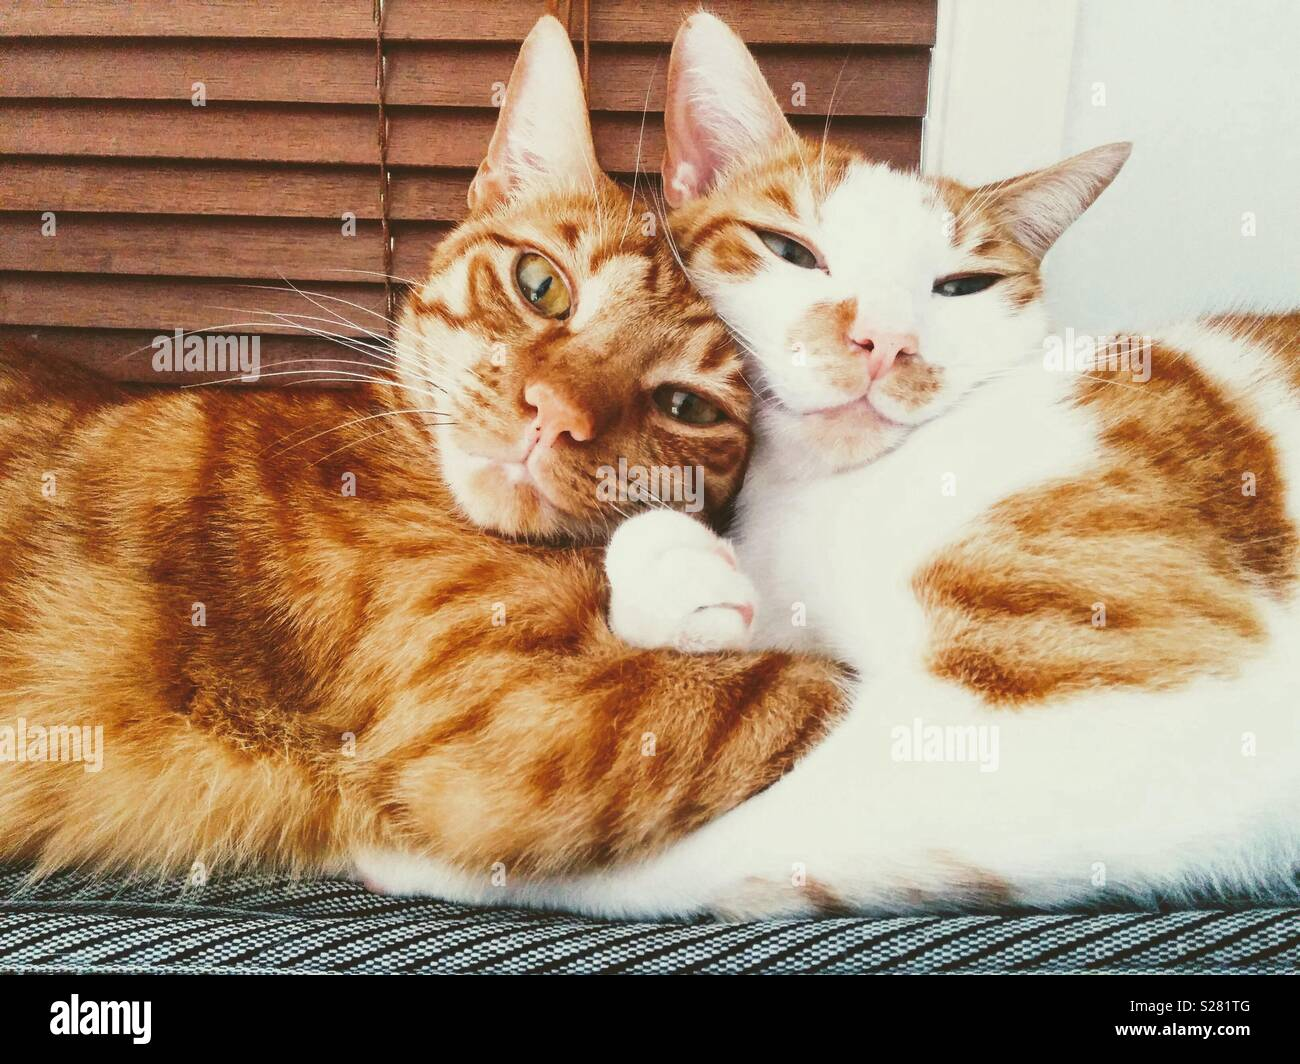 Feline Brotherly love - Stock Image